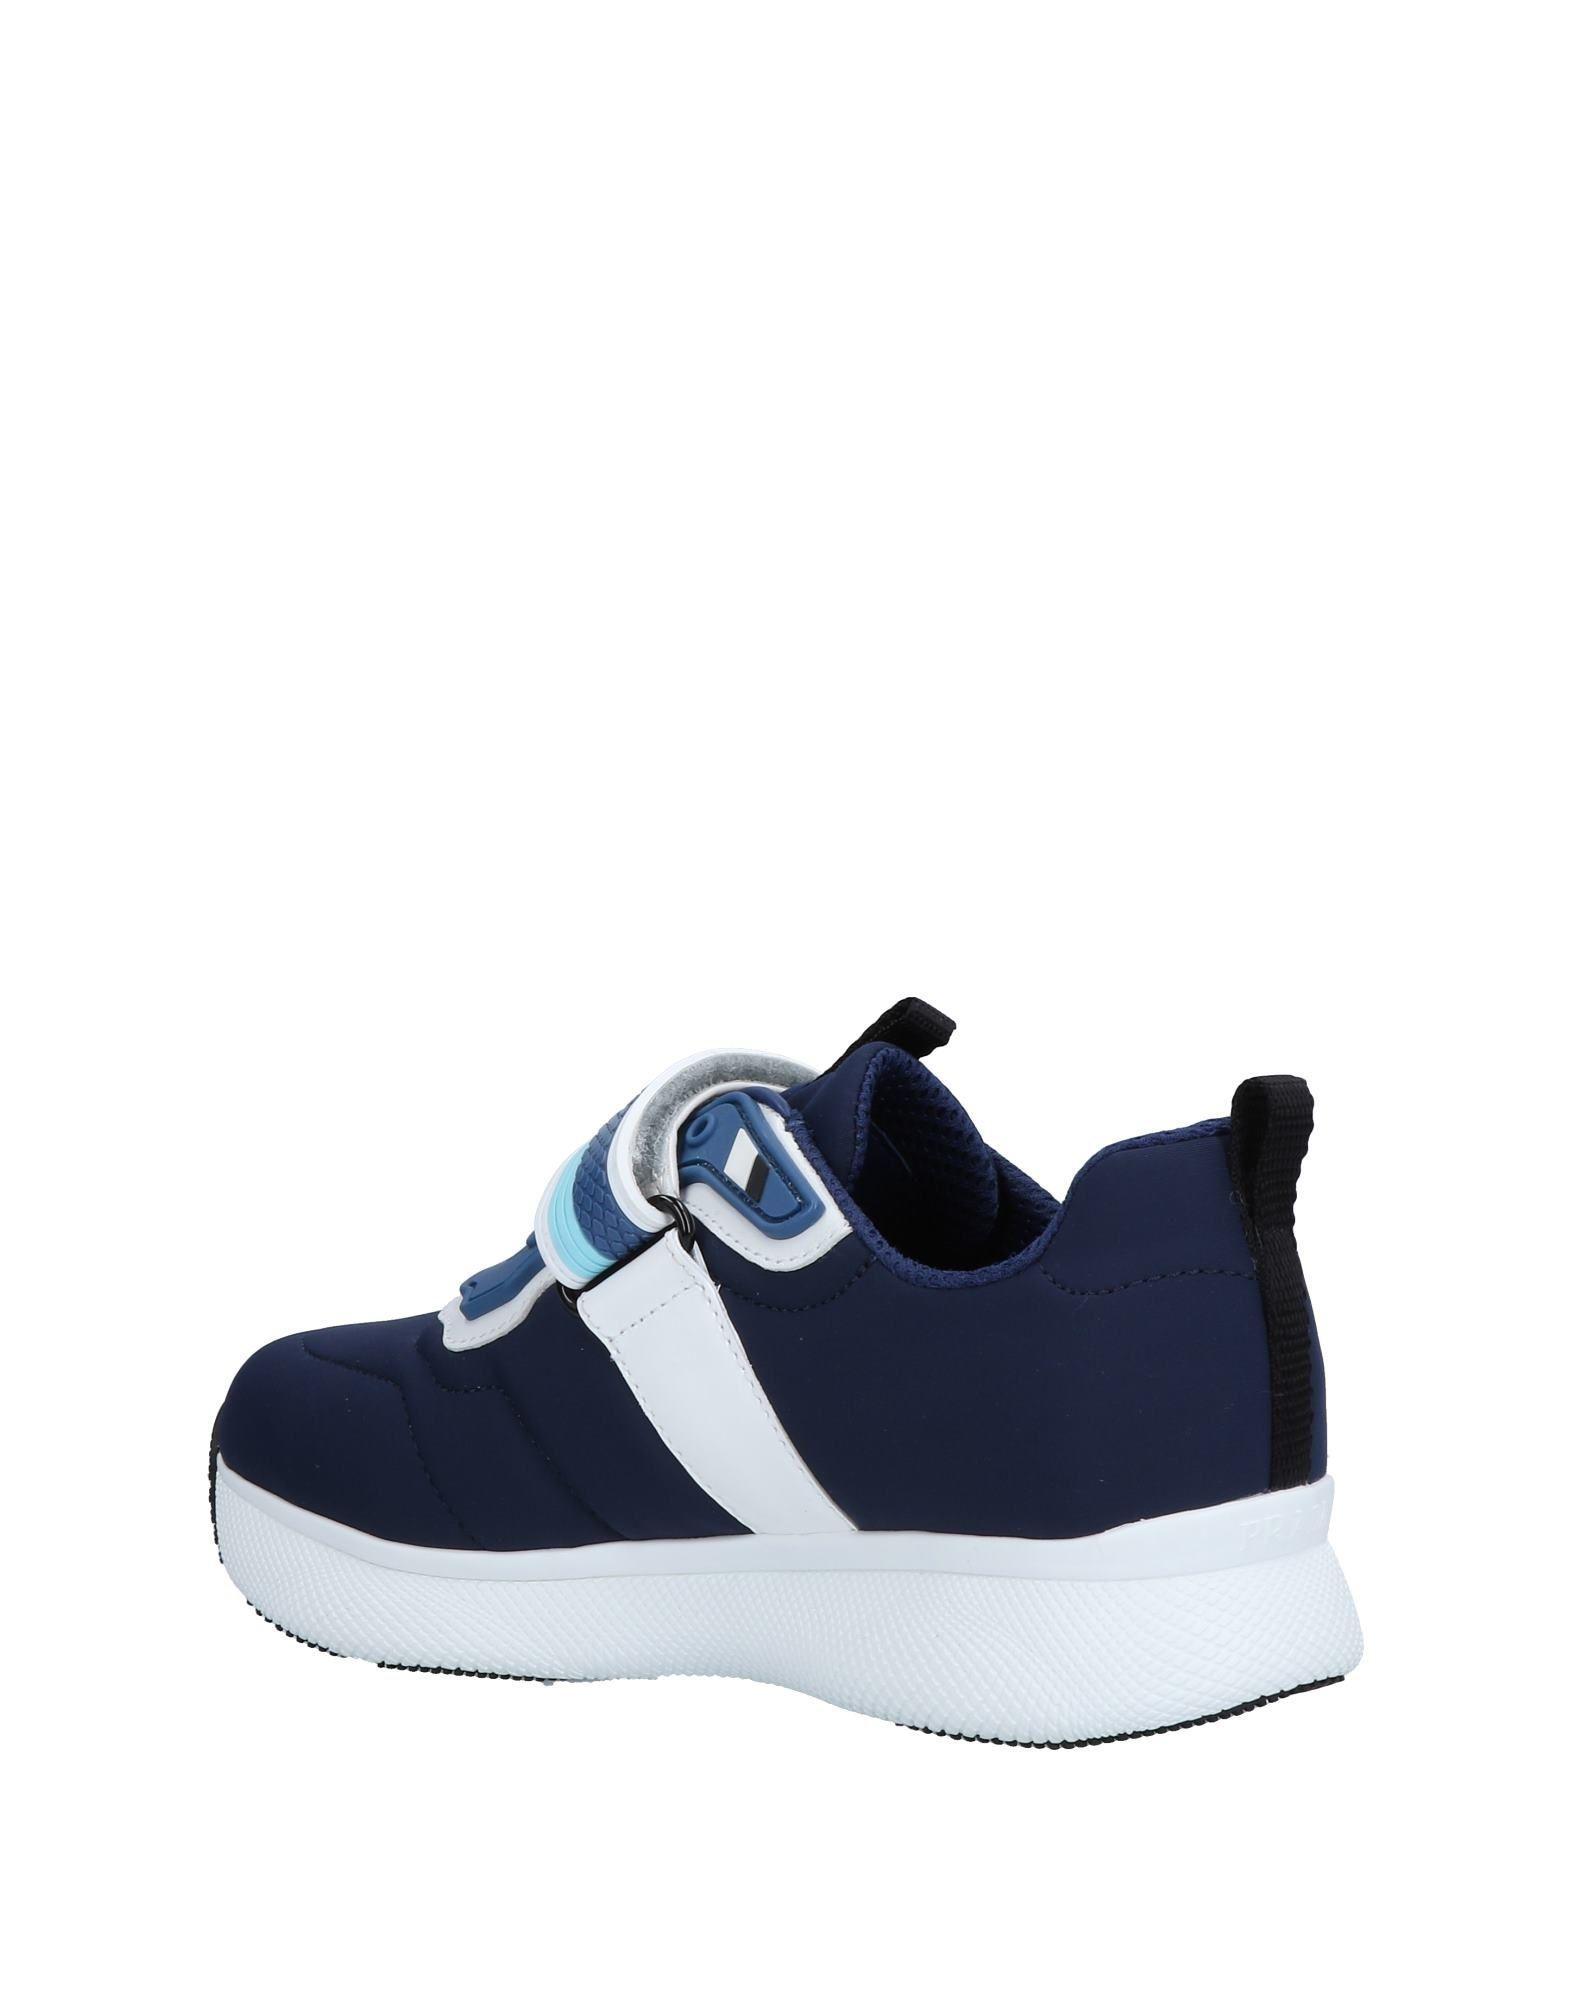 Prada Sport Neoprene Low-tops & Sneakers in Dark Blue (Blue)